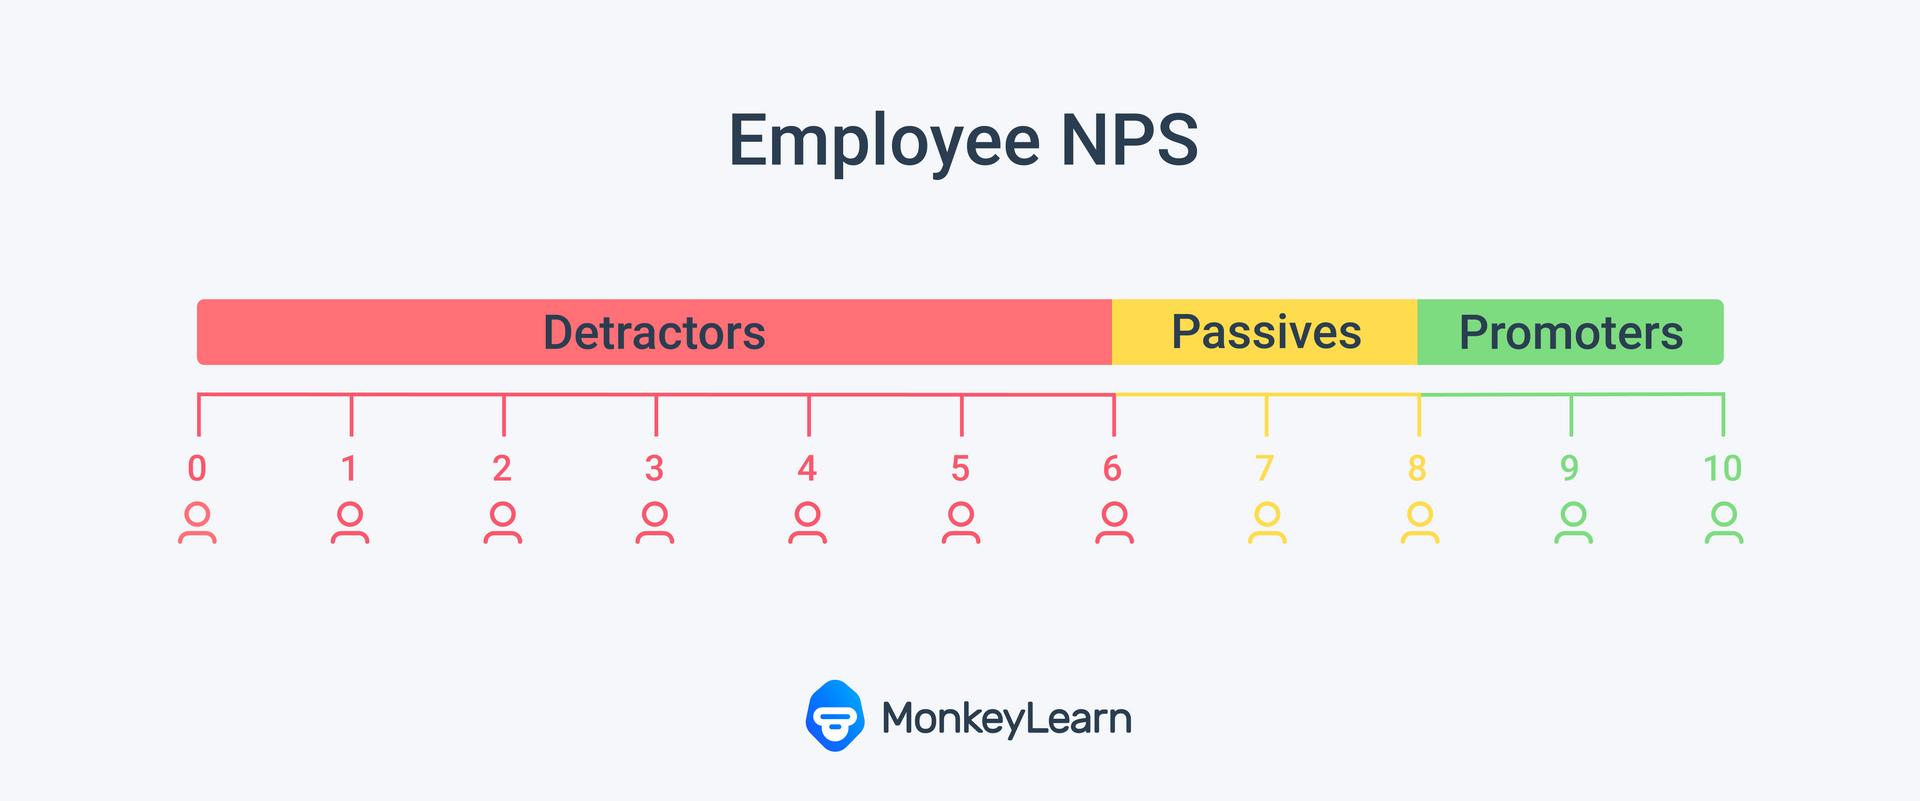 Employee Net Promoter Score Chart showing 9-10: Promoters, 7-8: Passives and 0-6: Detractors